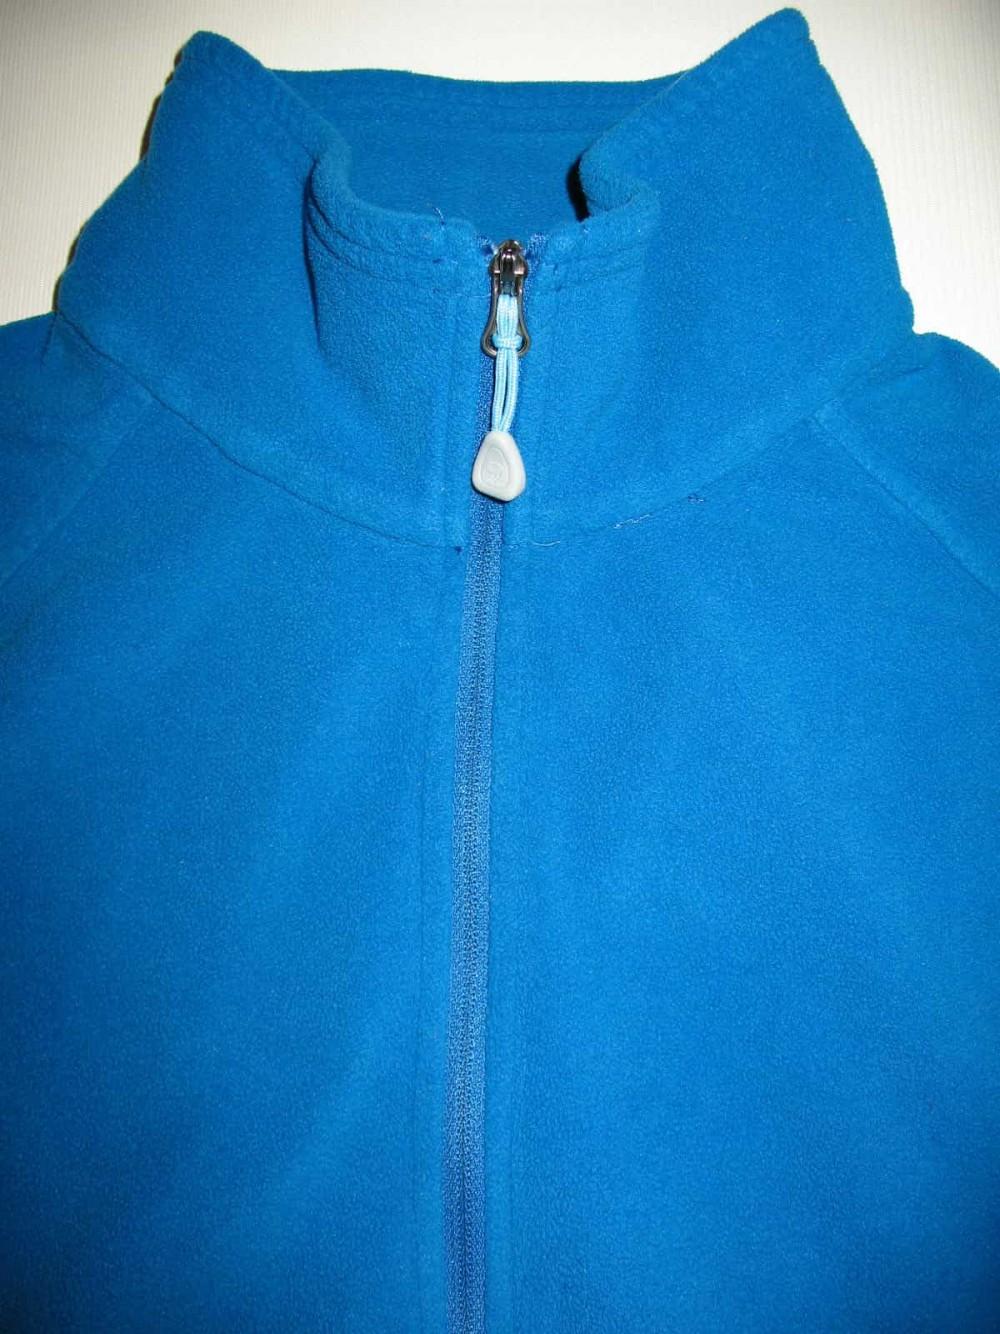 Кофта MOUNTAIN HARDWEAR fleece jersey lady (размер M) - 2